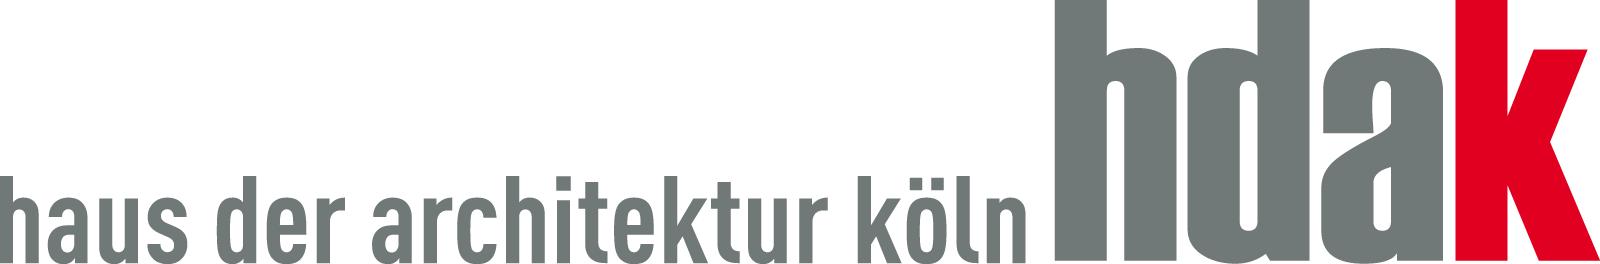 hdak_HKS-Prozess